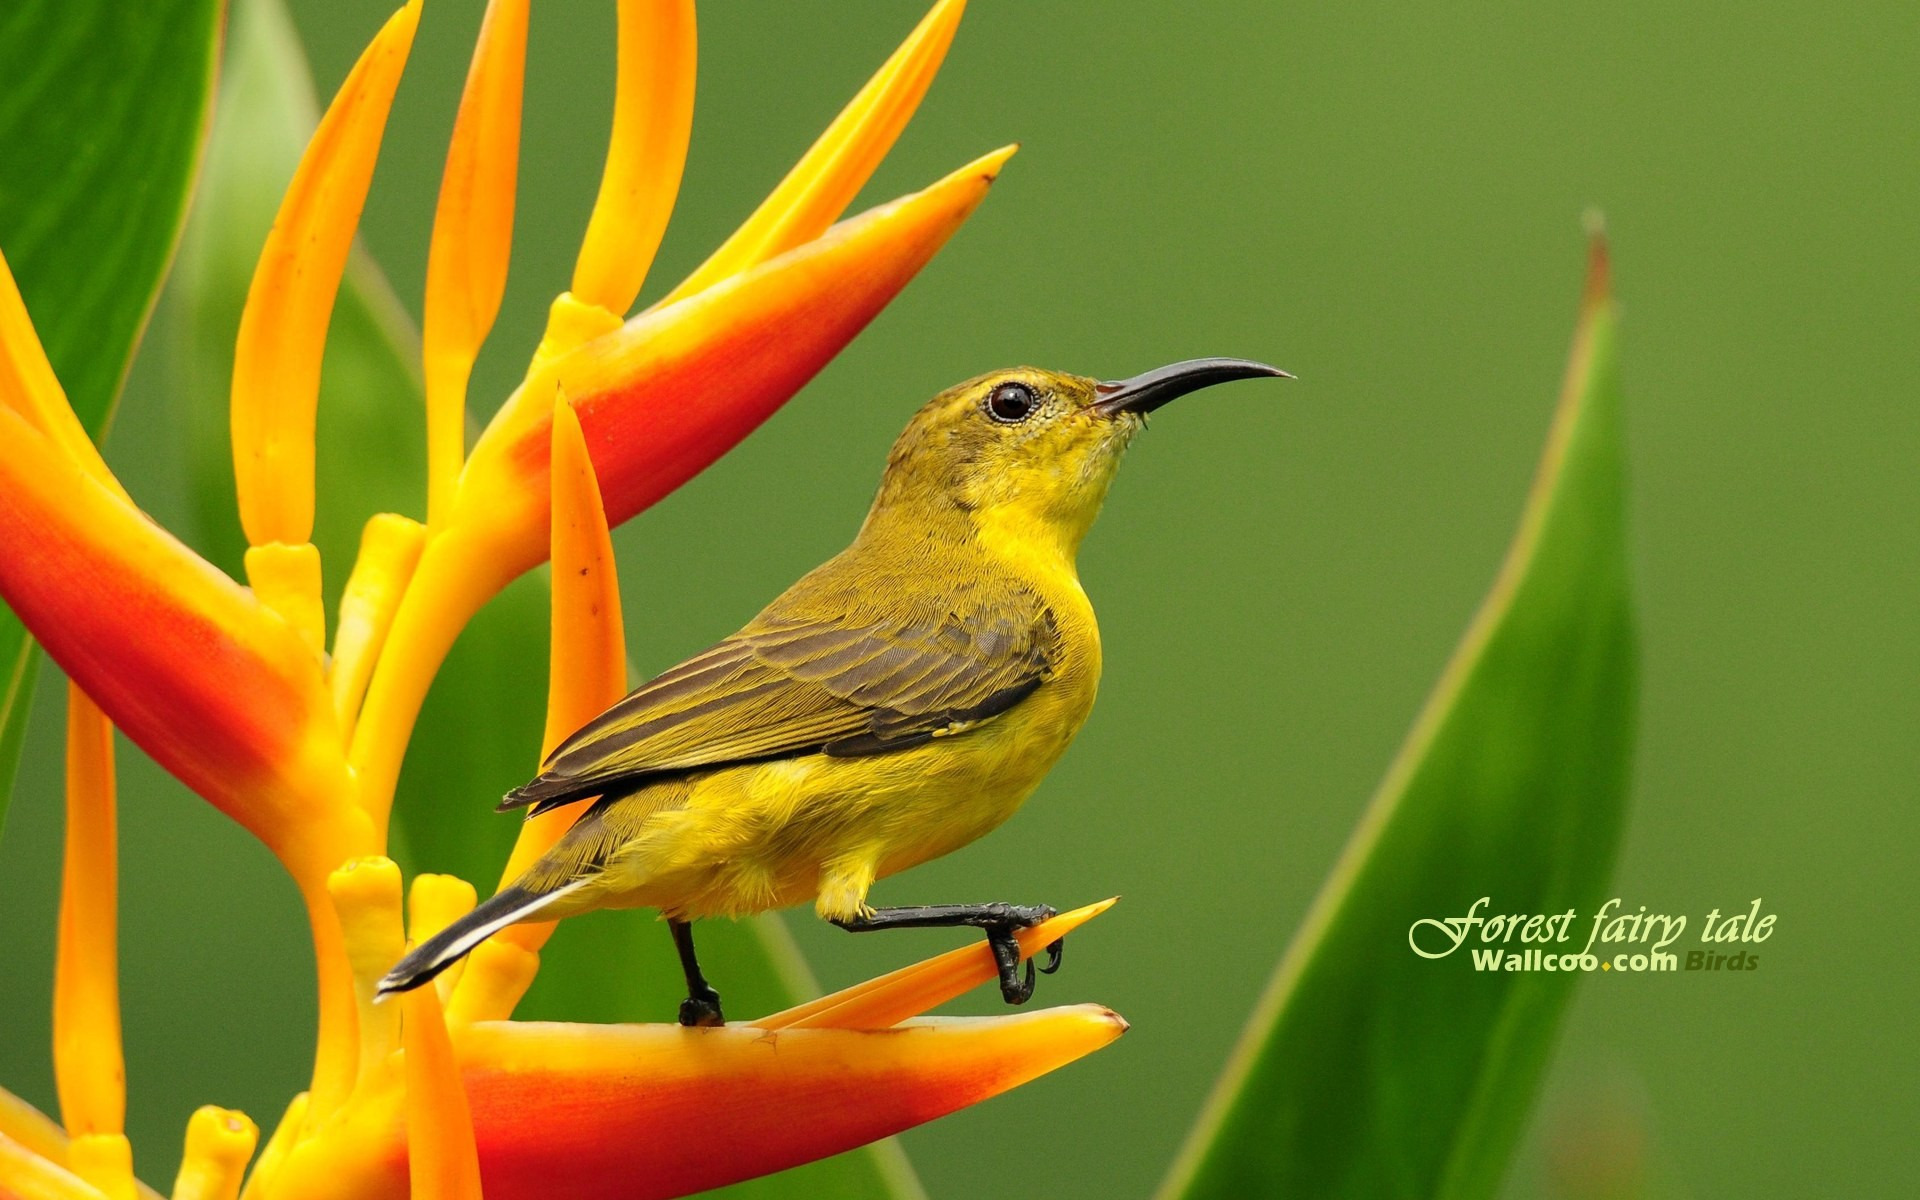 http://cdn.oboi7.com/742269028d63b479274690f0d5b4ad6e2624e3ac/pticy-zhivotnye-zhivaya-priroda-sunbirds.jpg